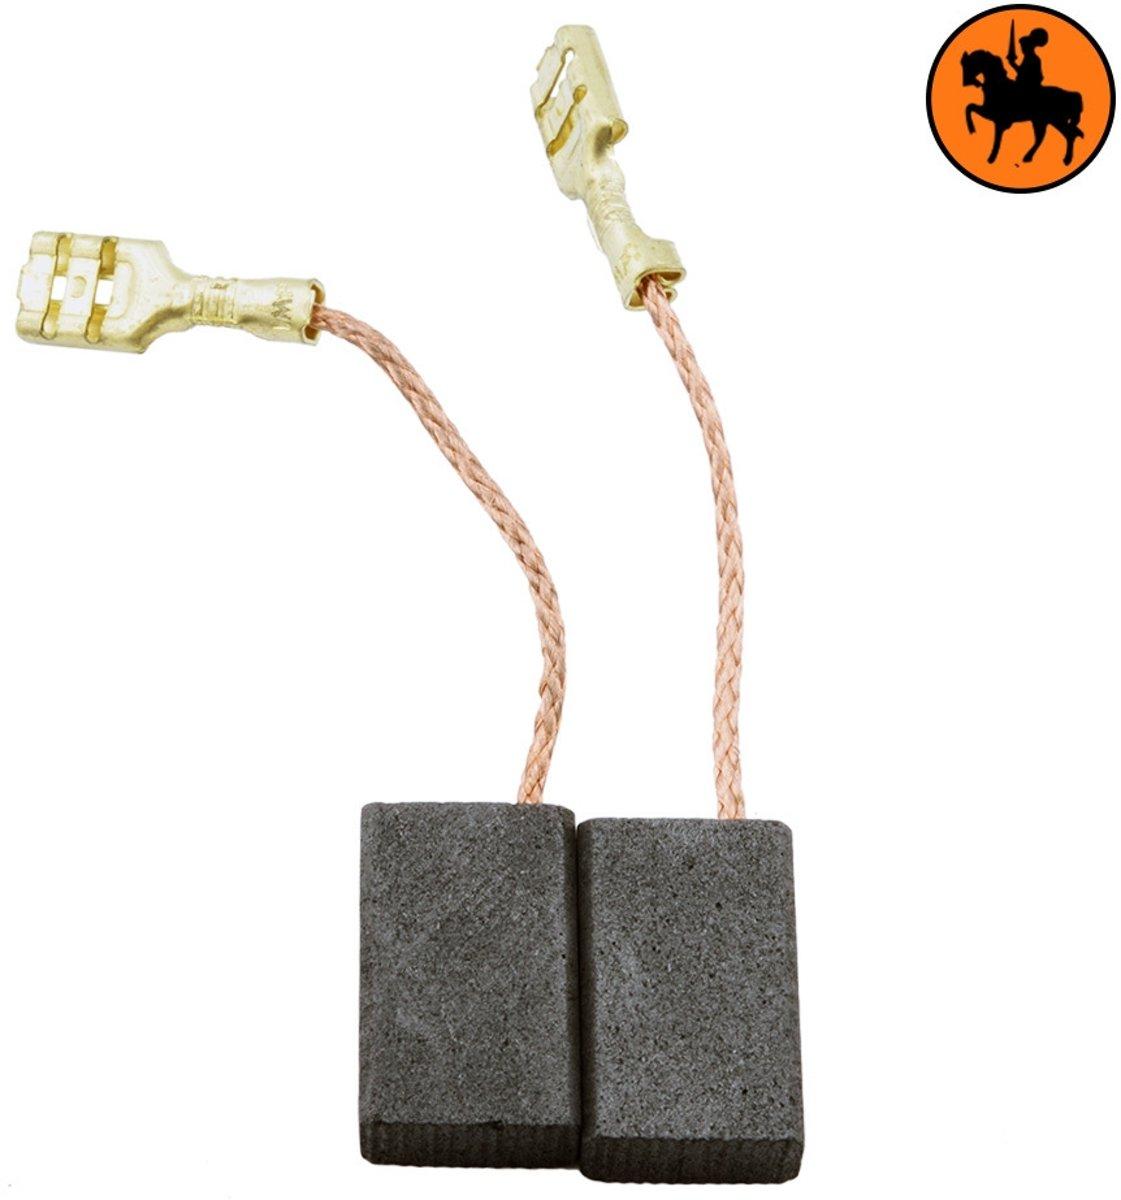 Koolborstelset voor AEG frees/zaag AGV15-125 XC - 5x10x16mm kopen